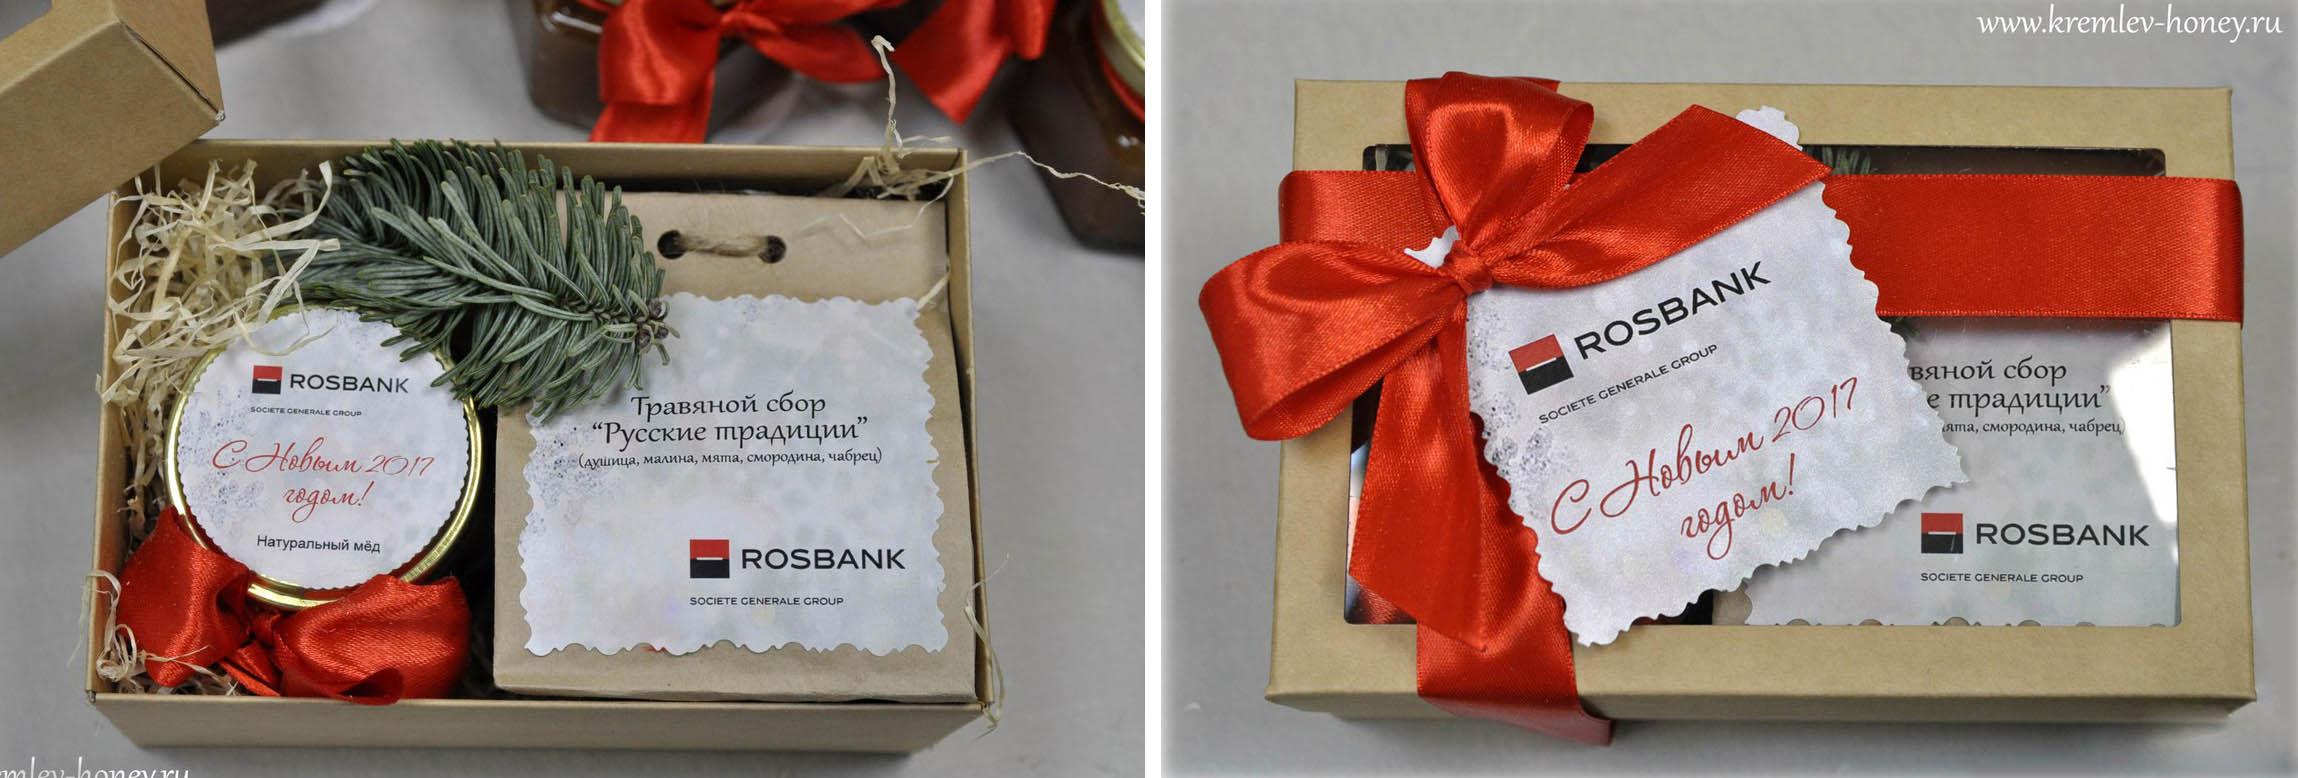 Подарки сотрудникам от компании 155